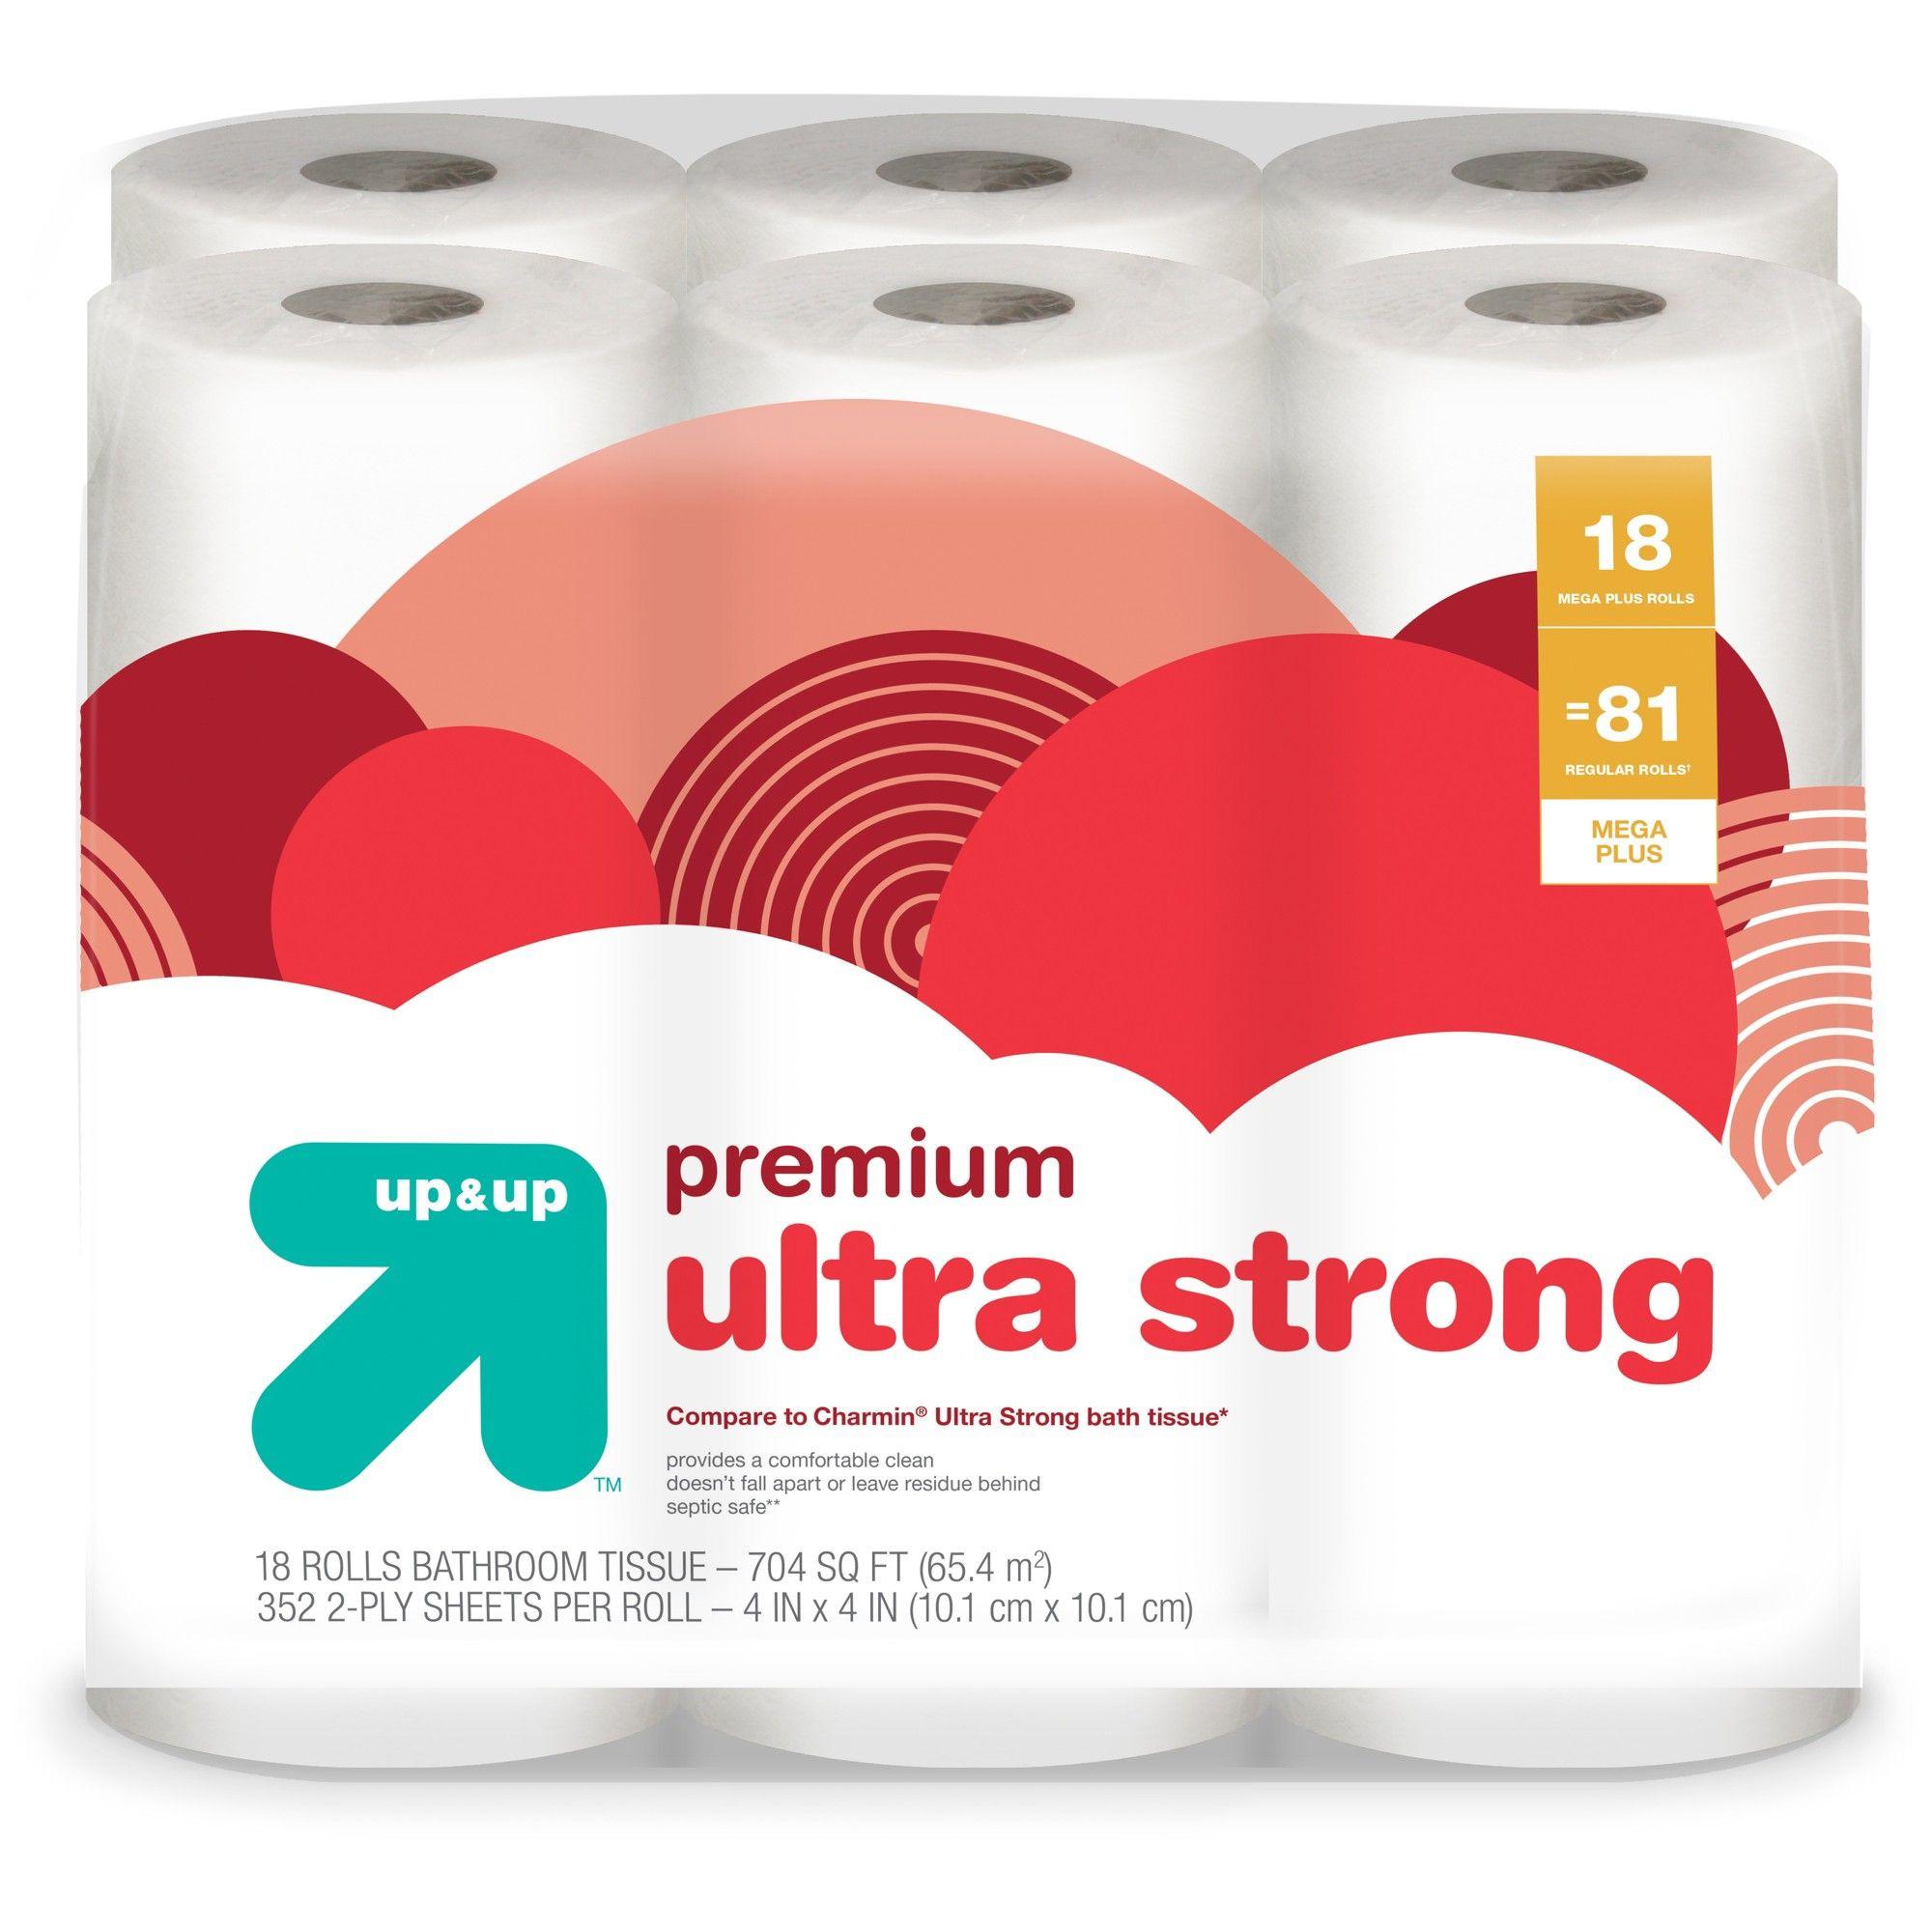 Premium Ultra Strong Toilet Paper 18 Mega Plus Rolls Compare To